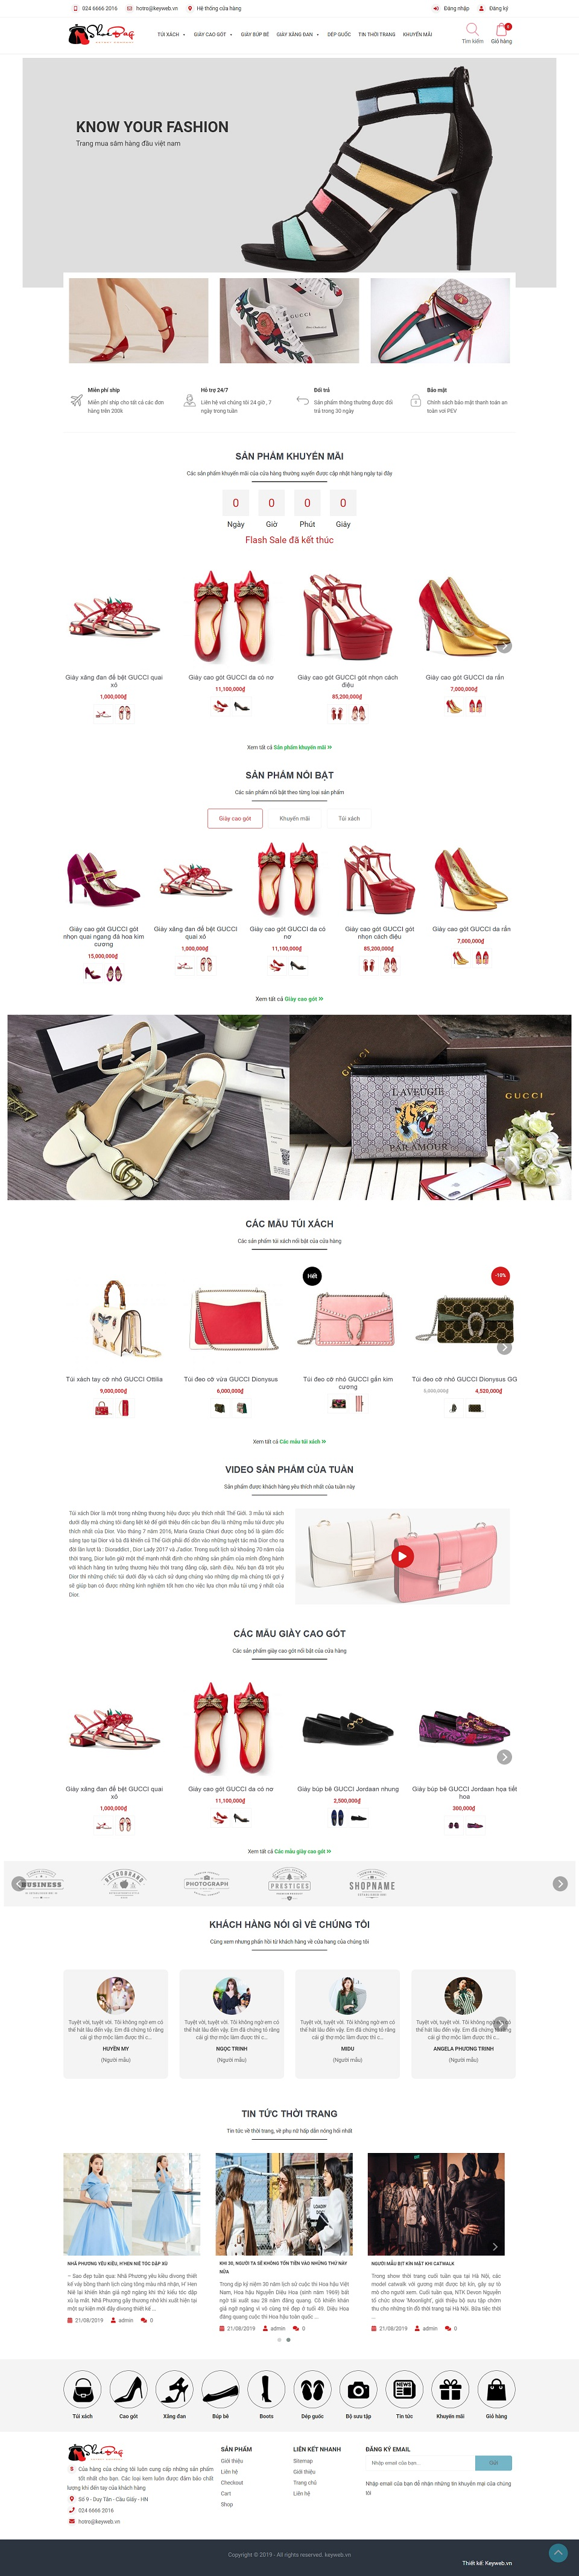 Mẫu website shop phụ kiện thời trang ShoeBag